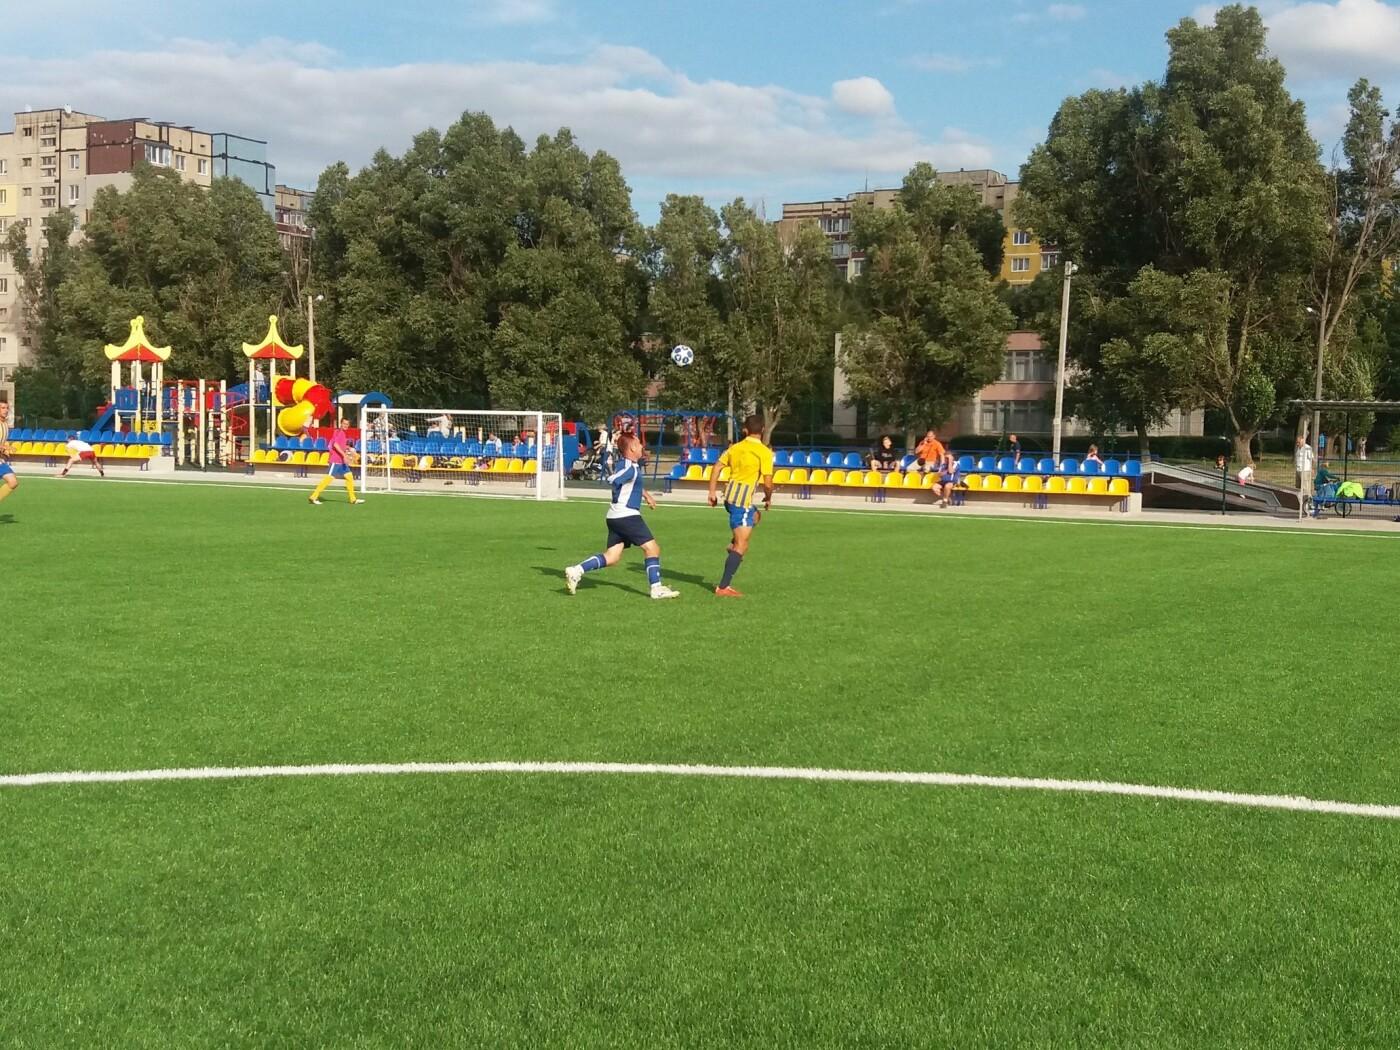 В Каменском проходит Кубок мэра по футболу, фото-1